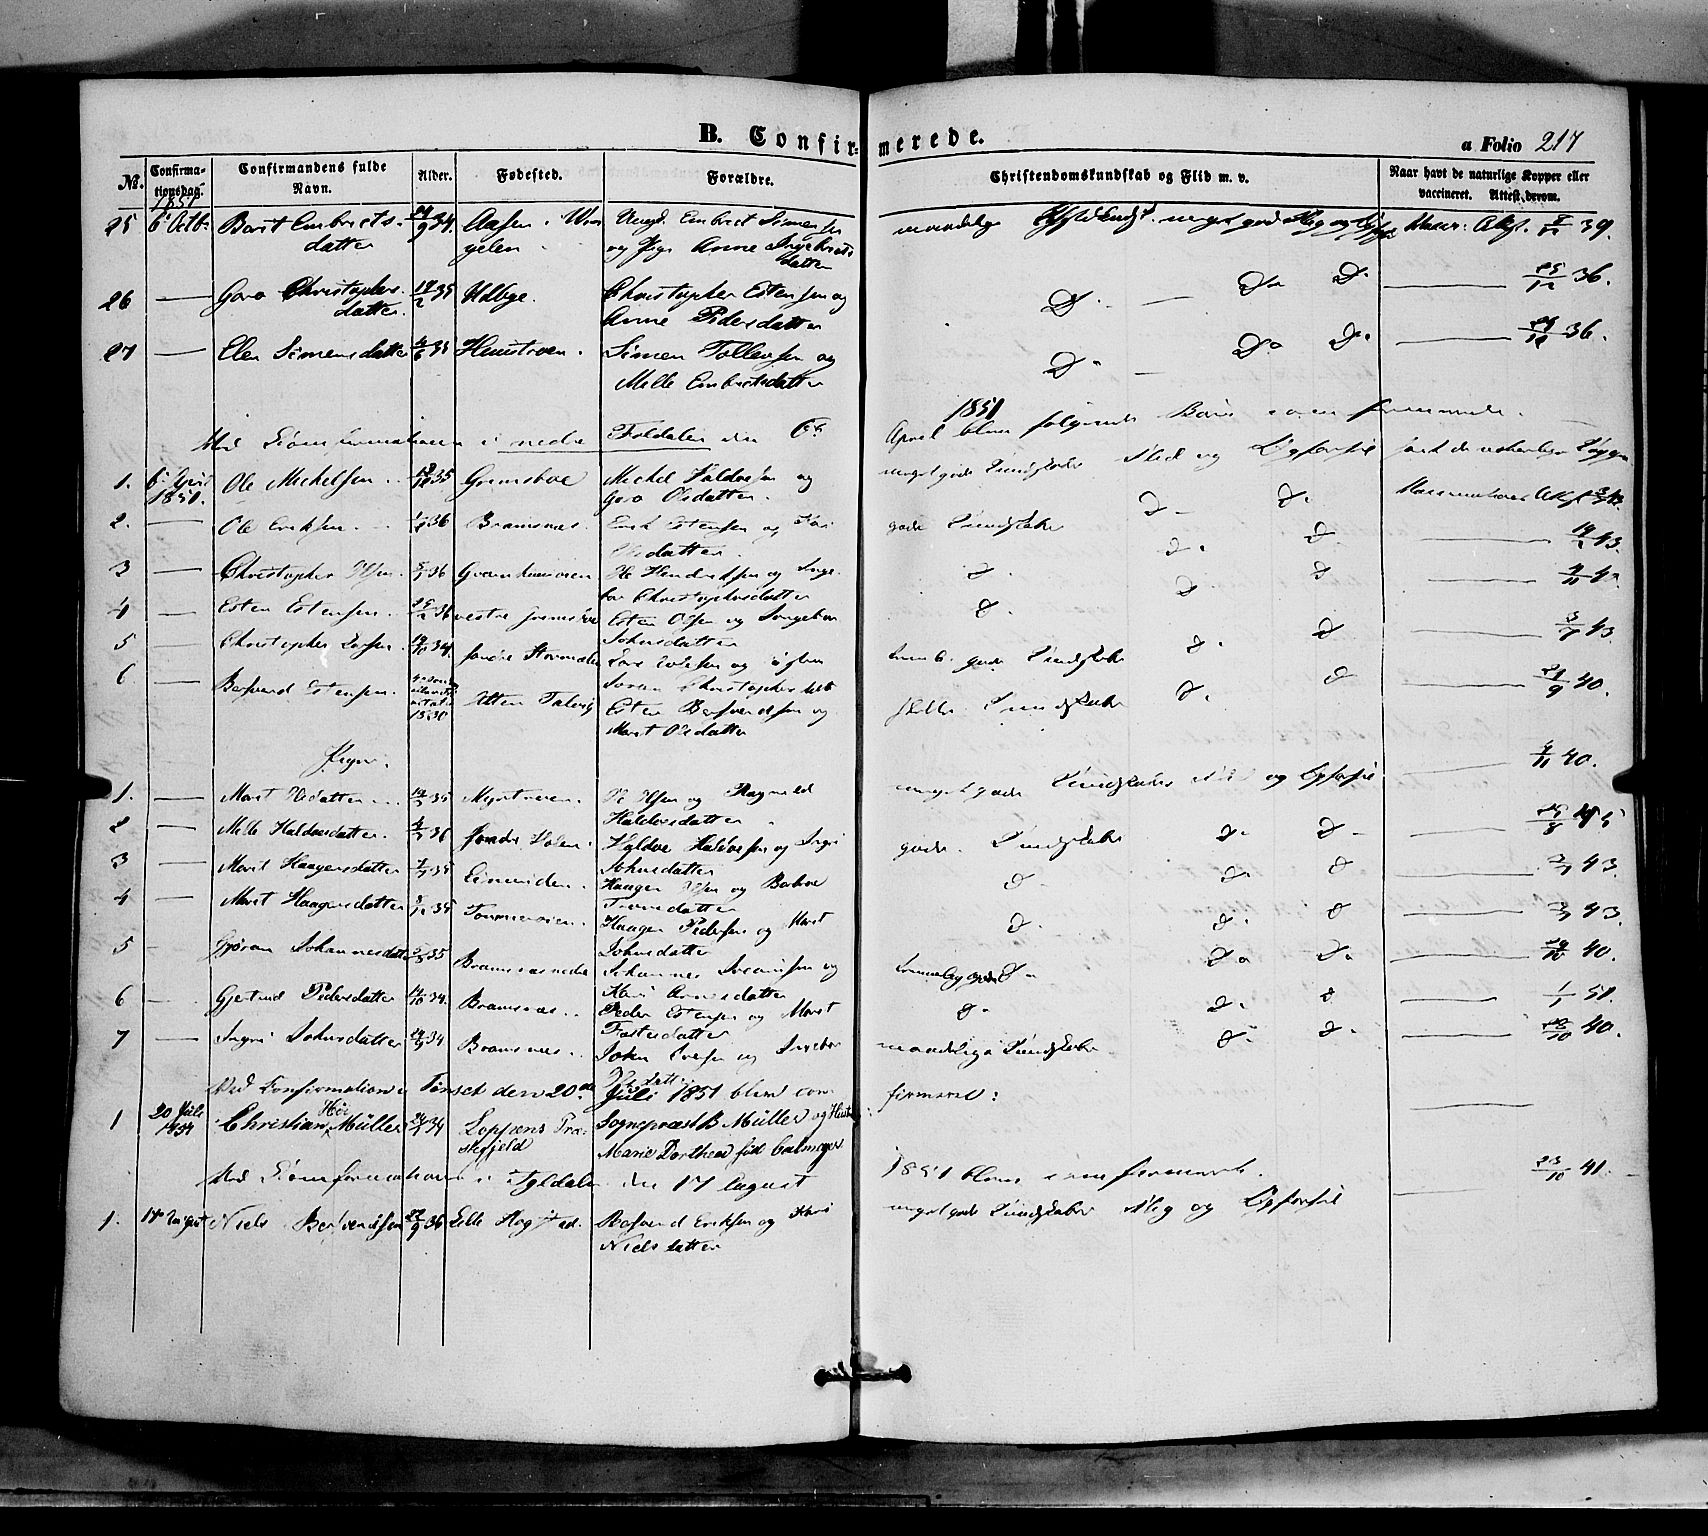 SAH, Tynset prestekontor, Ministerialbok nr. 20, 1848-1862, s. 217